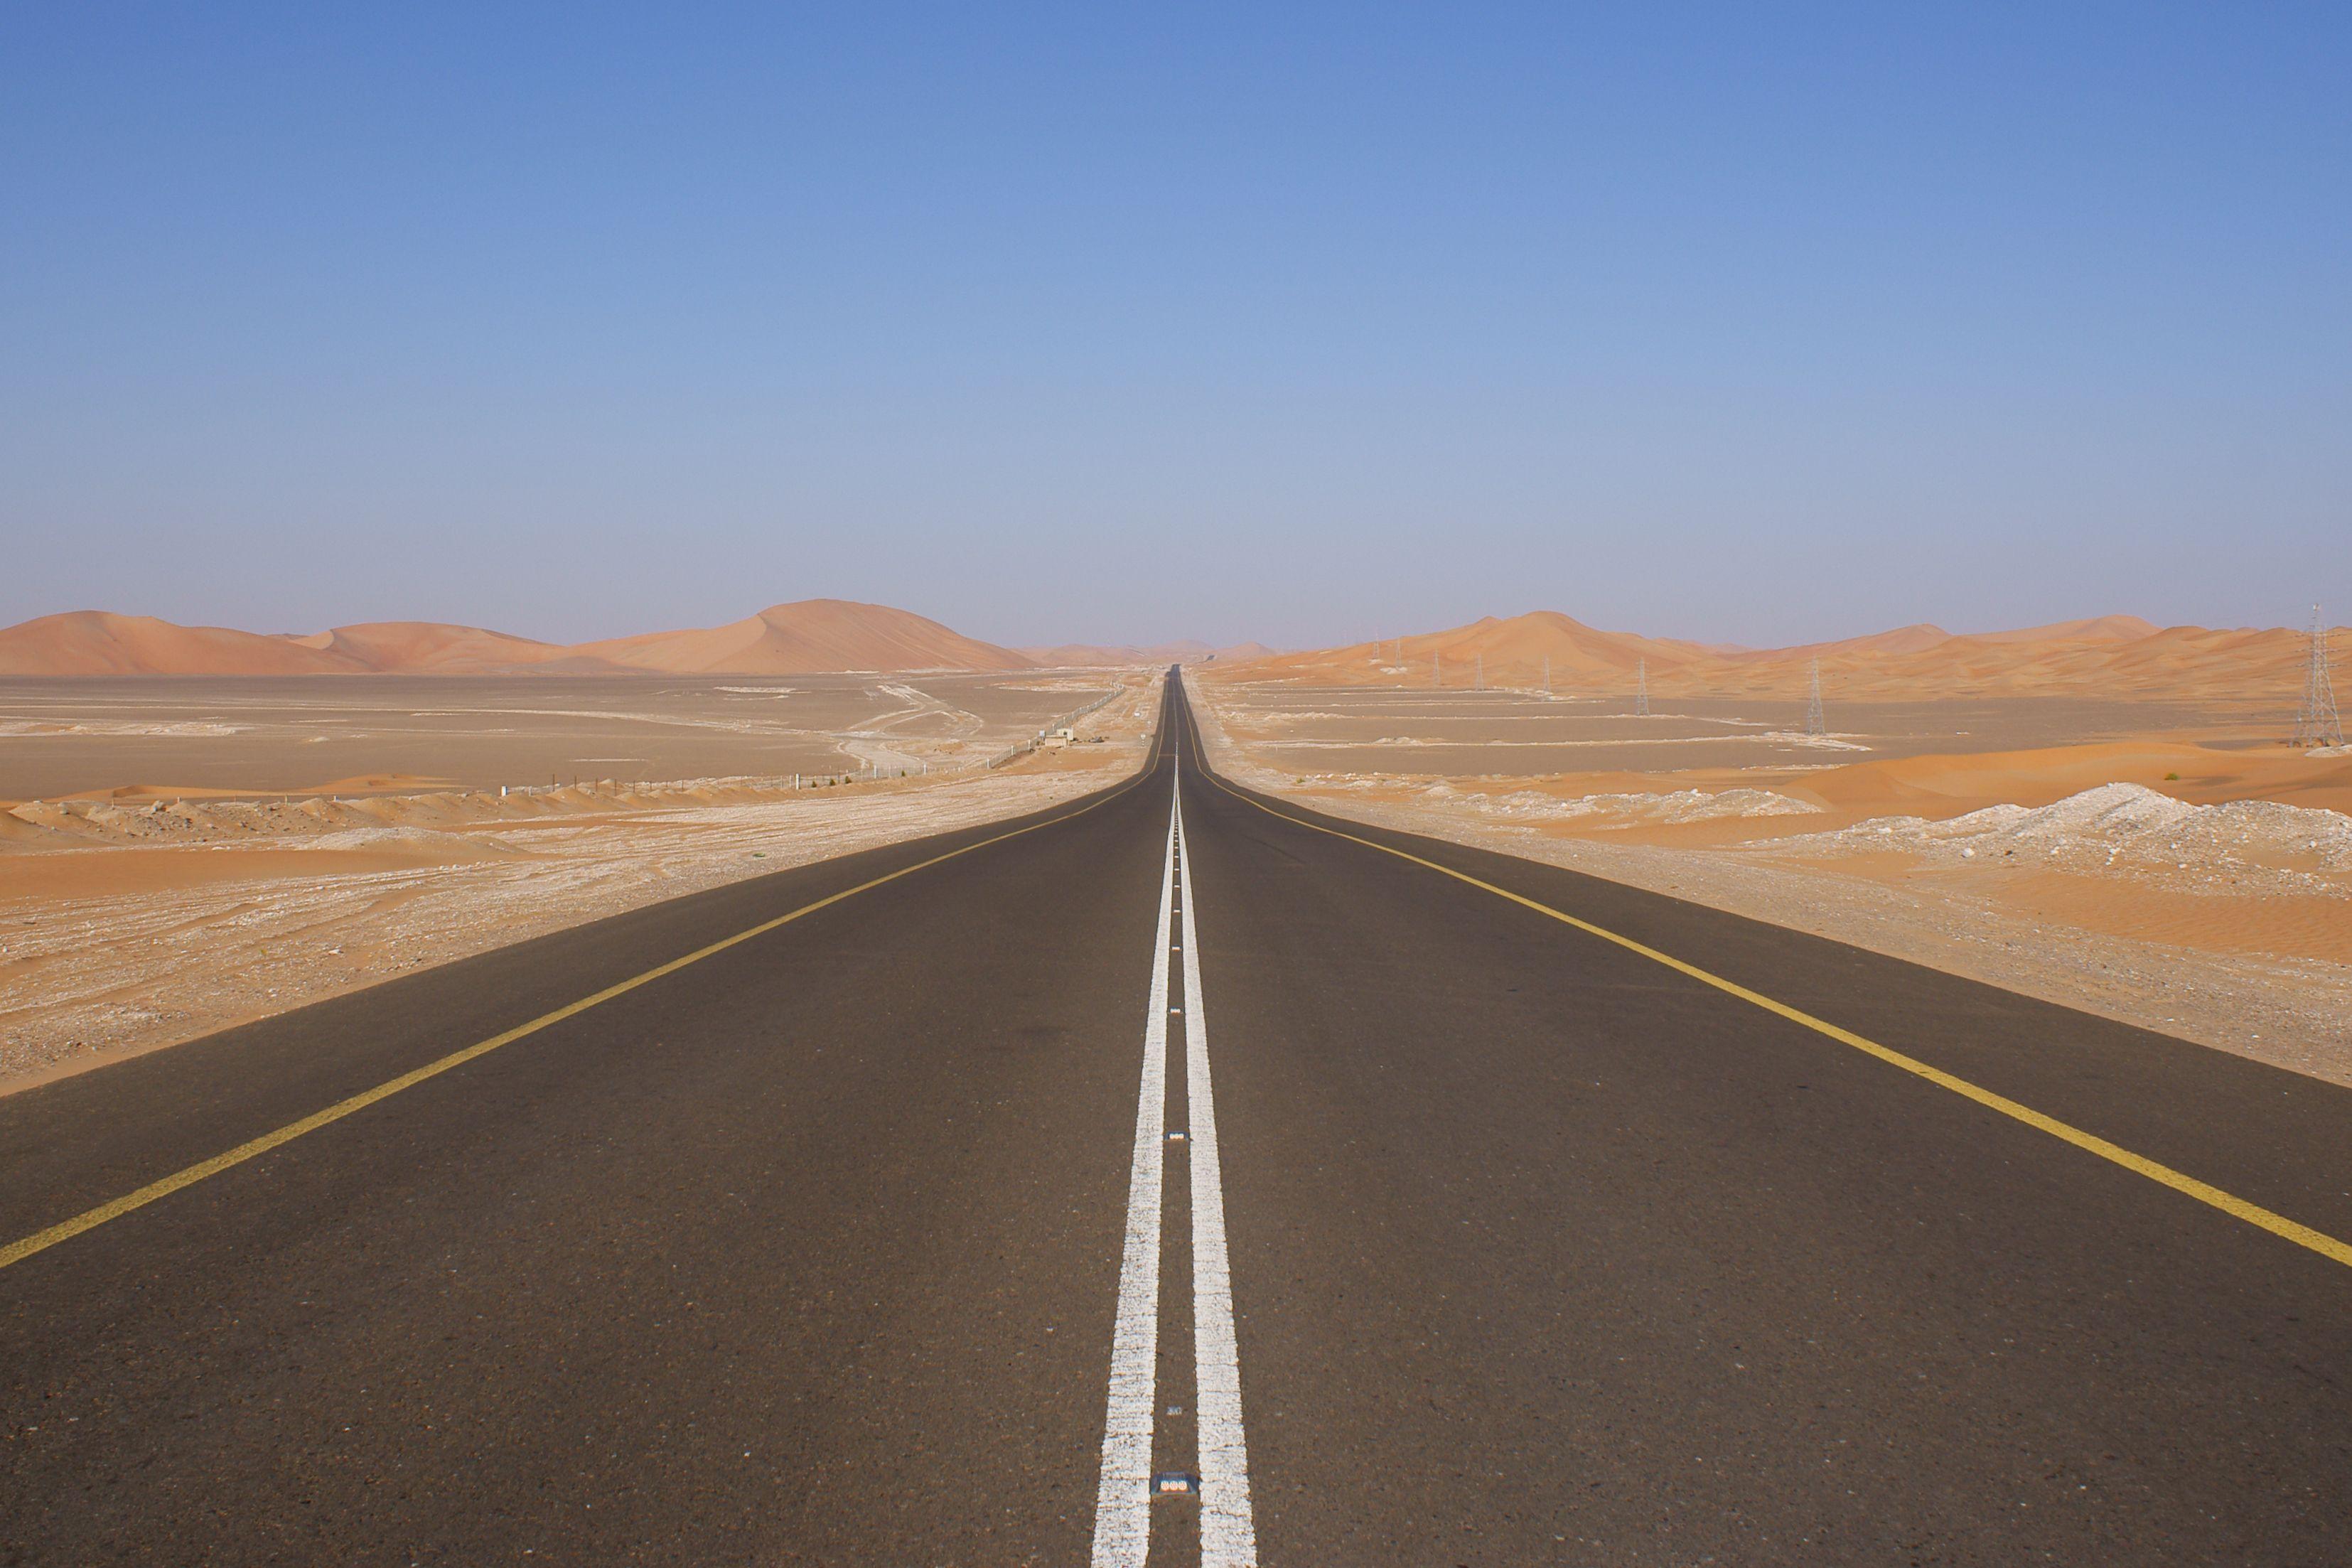 Desert Road UAE Free Wallpapers HD Related